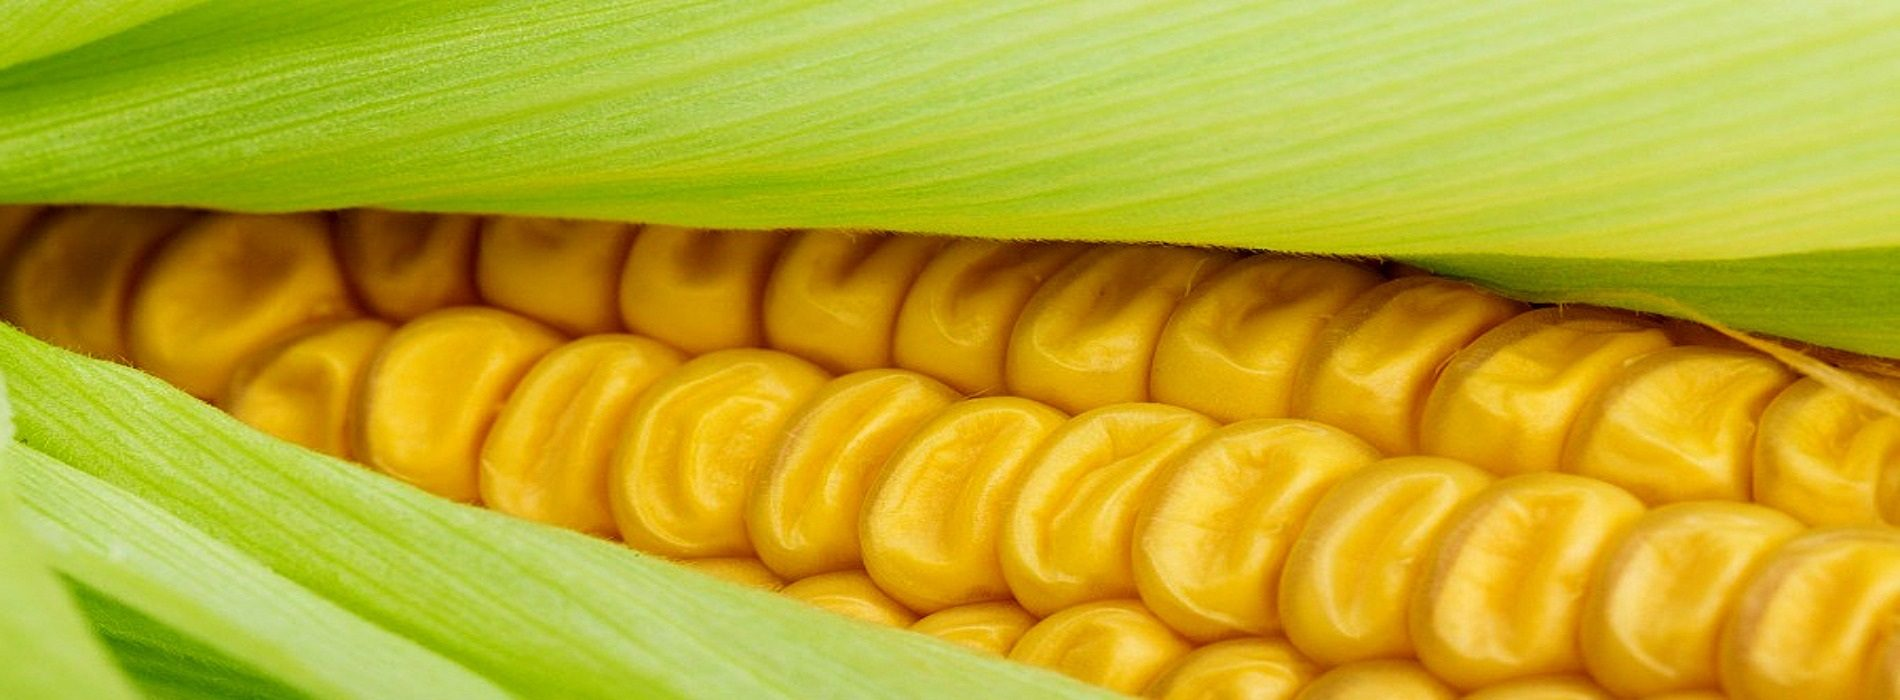 Zambia returns to maize bumper harvest